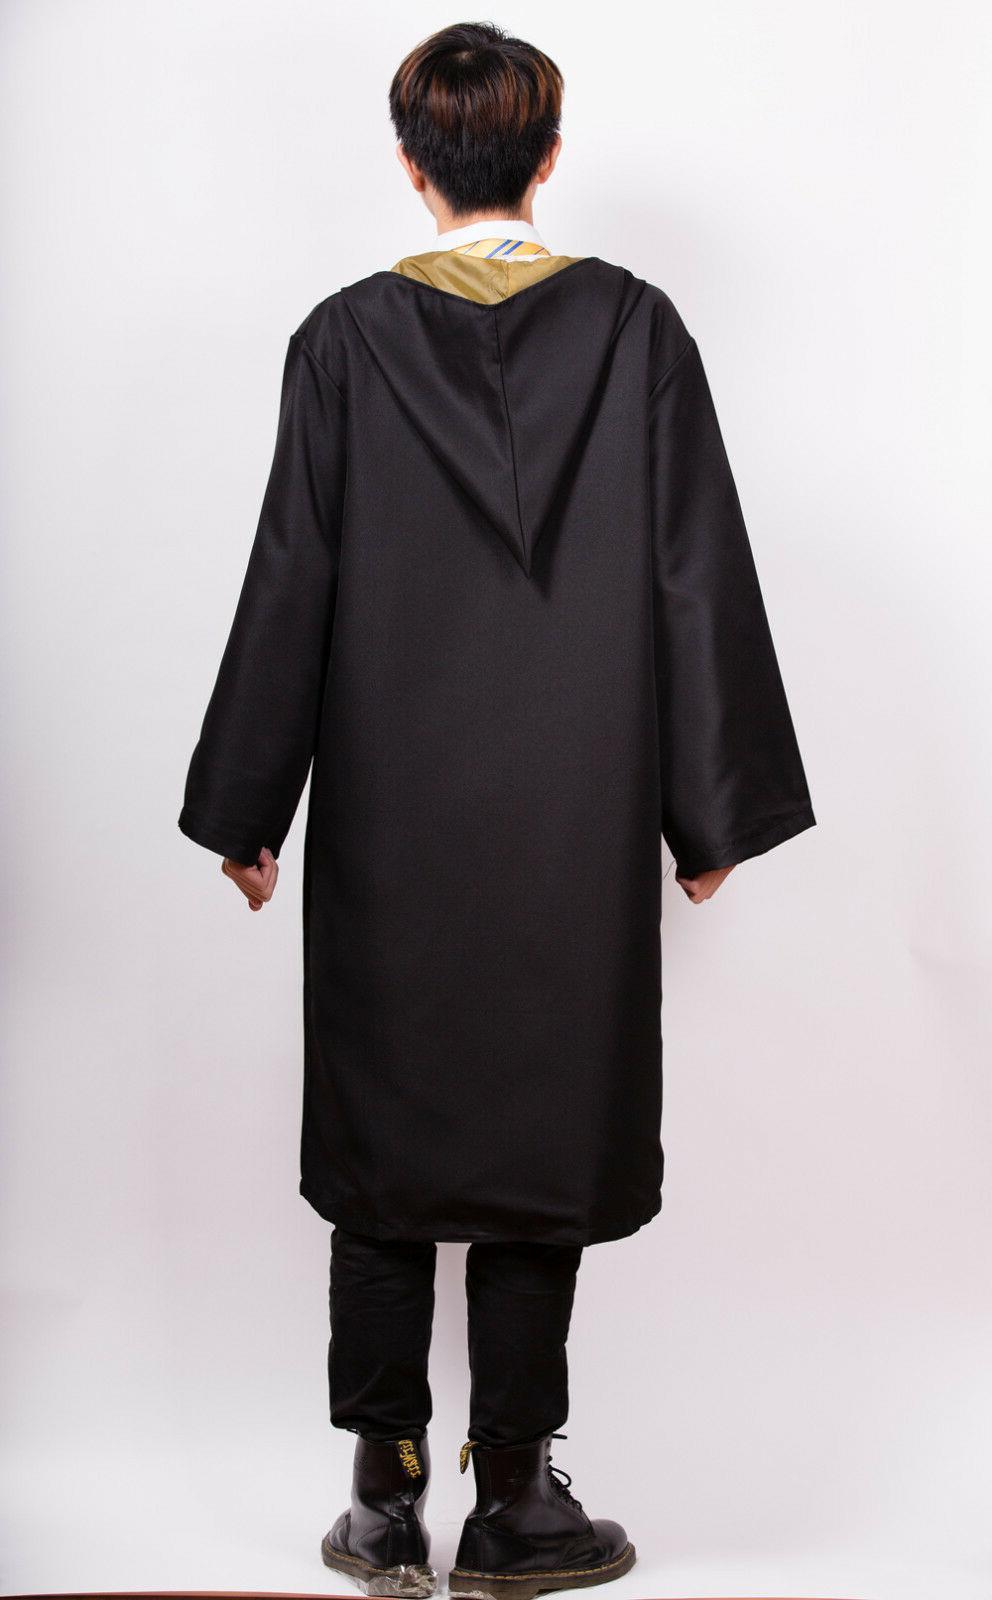 Hufflepuff Adult Robe Tie Set Deathly Costume Cloak Cape Gift